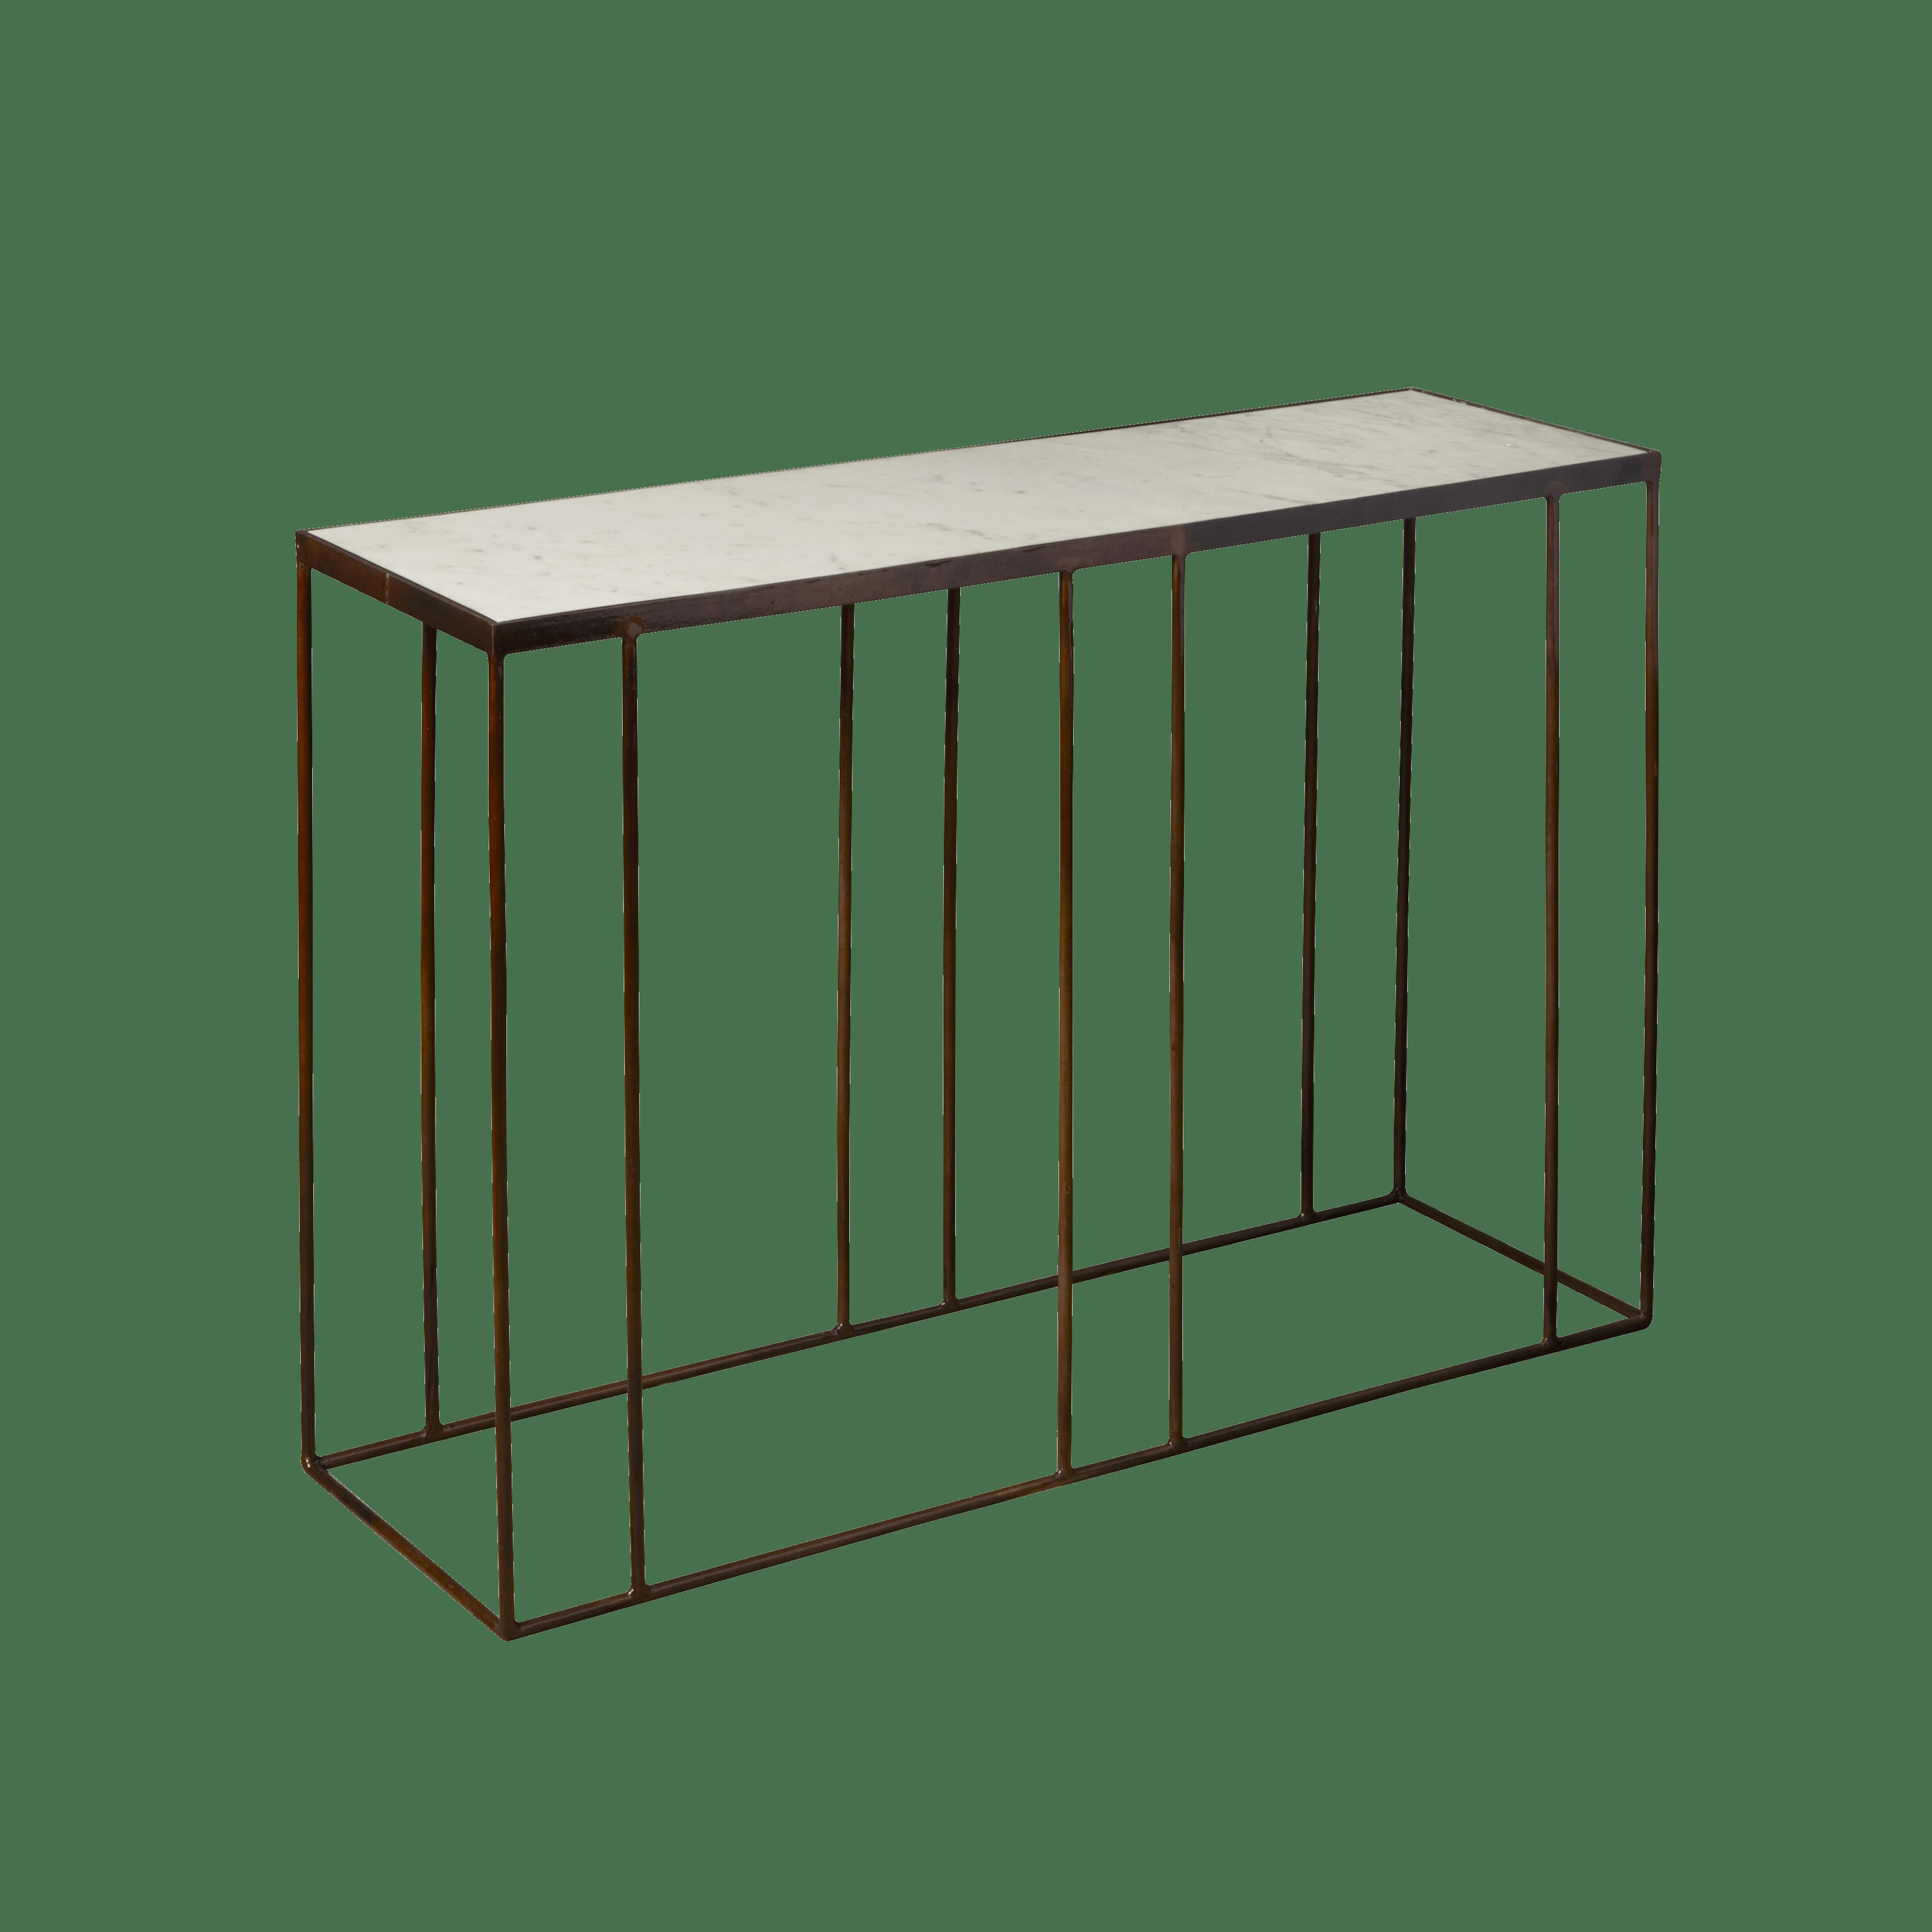 Tafel - Bijzettafels - Iron console table w marble top 103x31x77